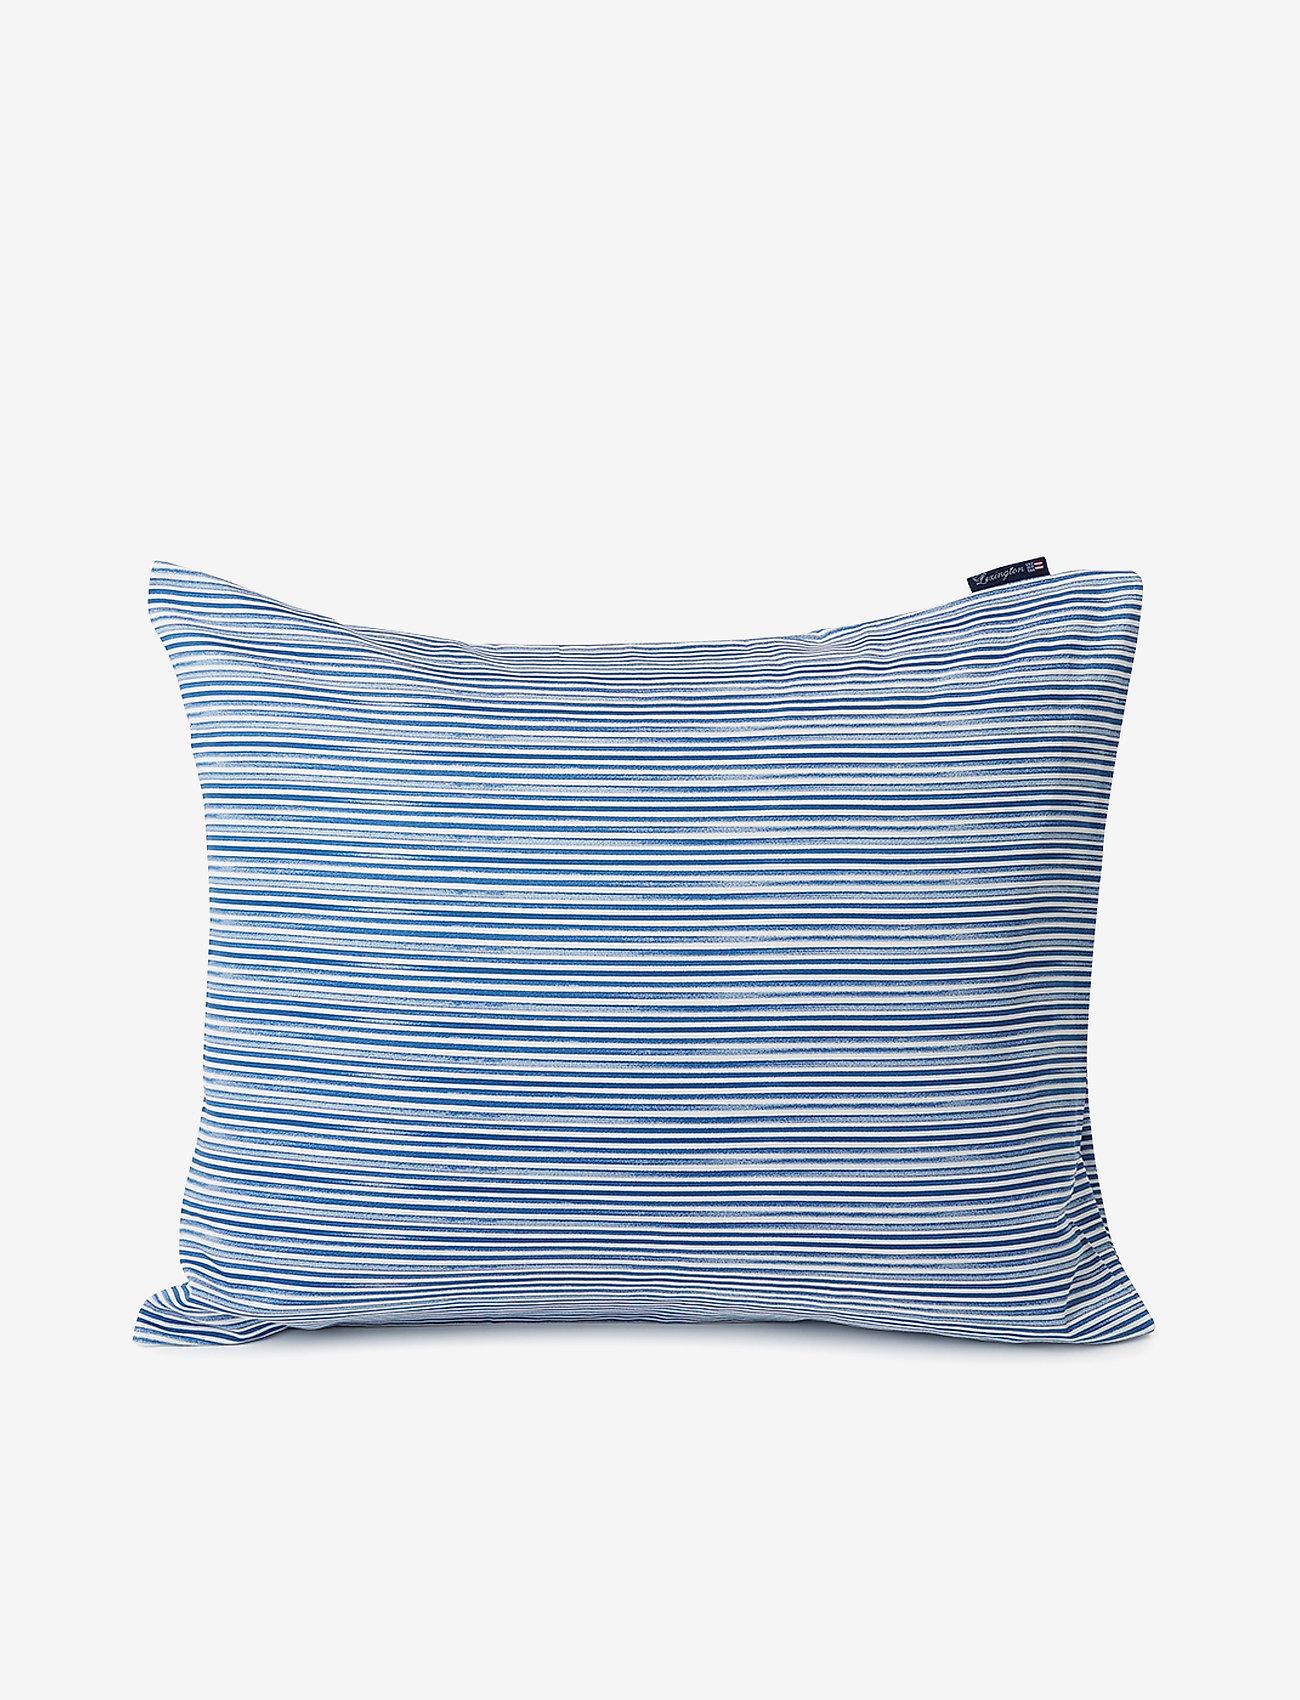 Lexington Home - Blue Striped Organic Cotton Sateen Pillowcase - taies d'oreiller - blue/white - 0